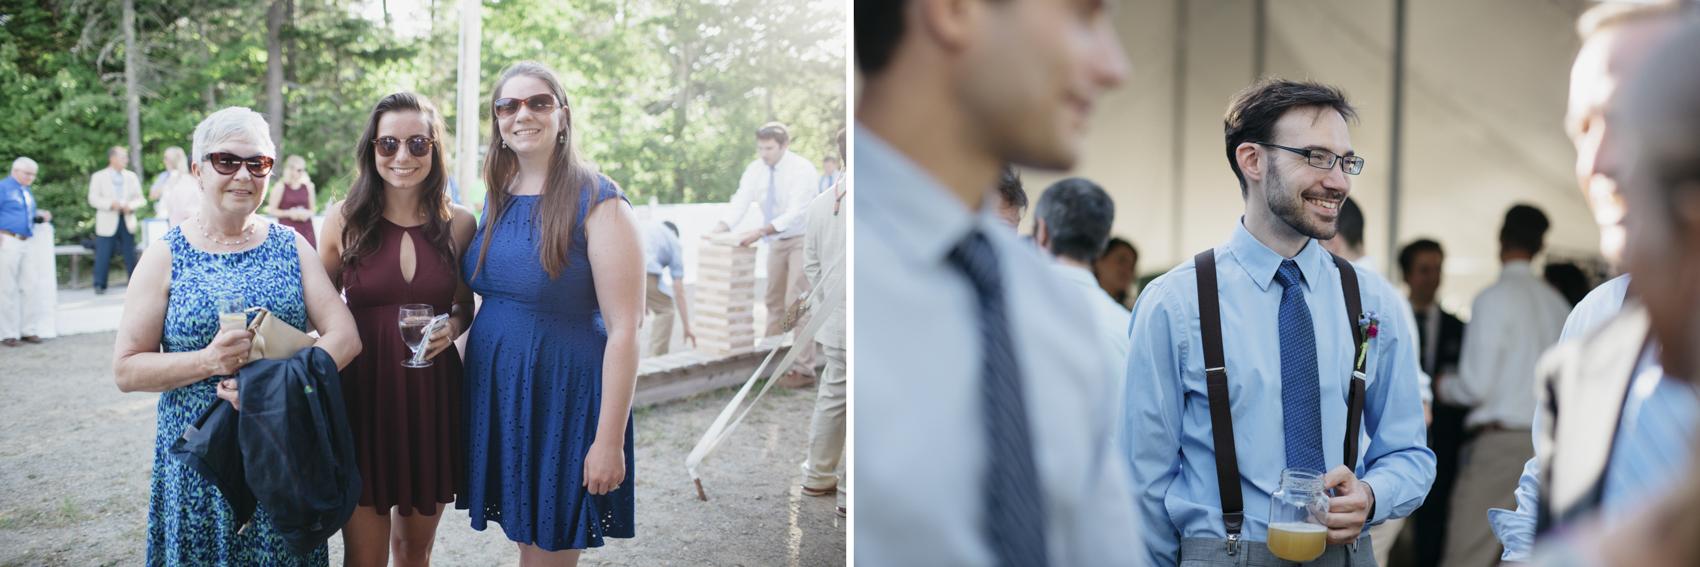 LFA_JuliaGlenn_Sugarloaf_Maine_Wedding018.jpg